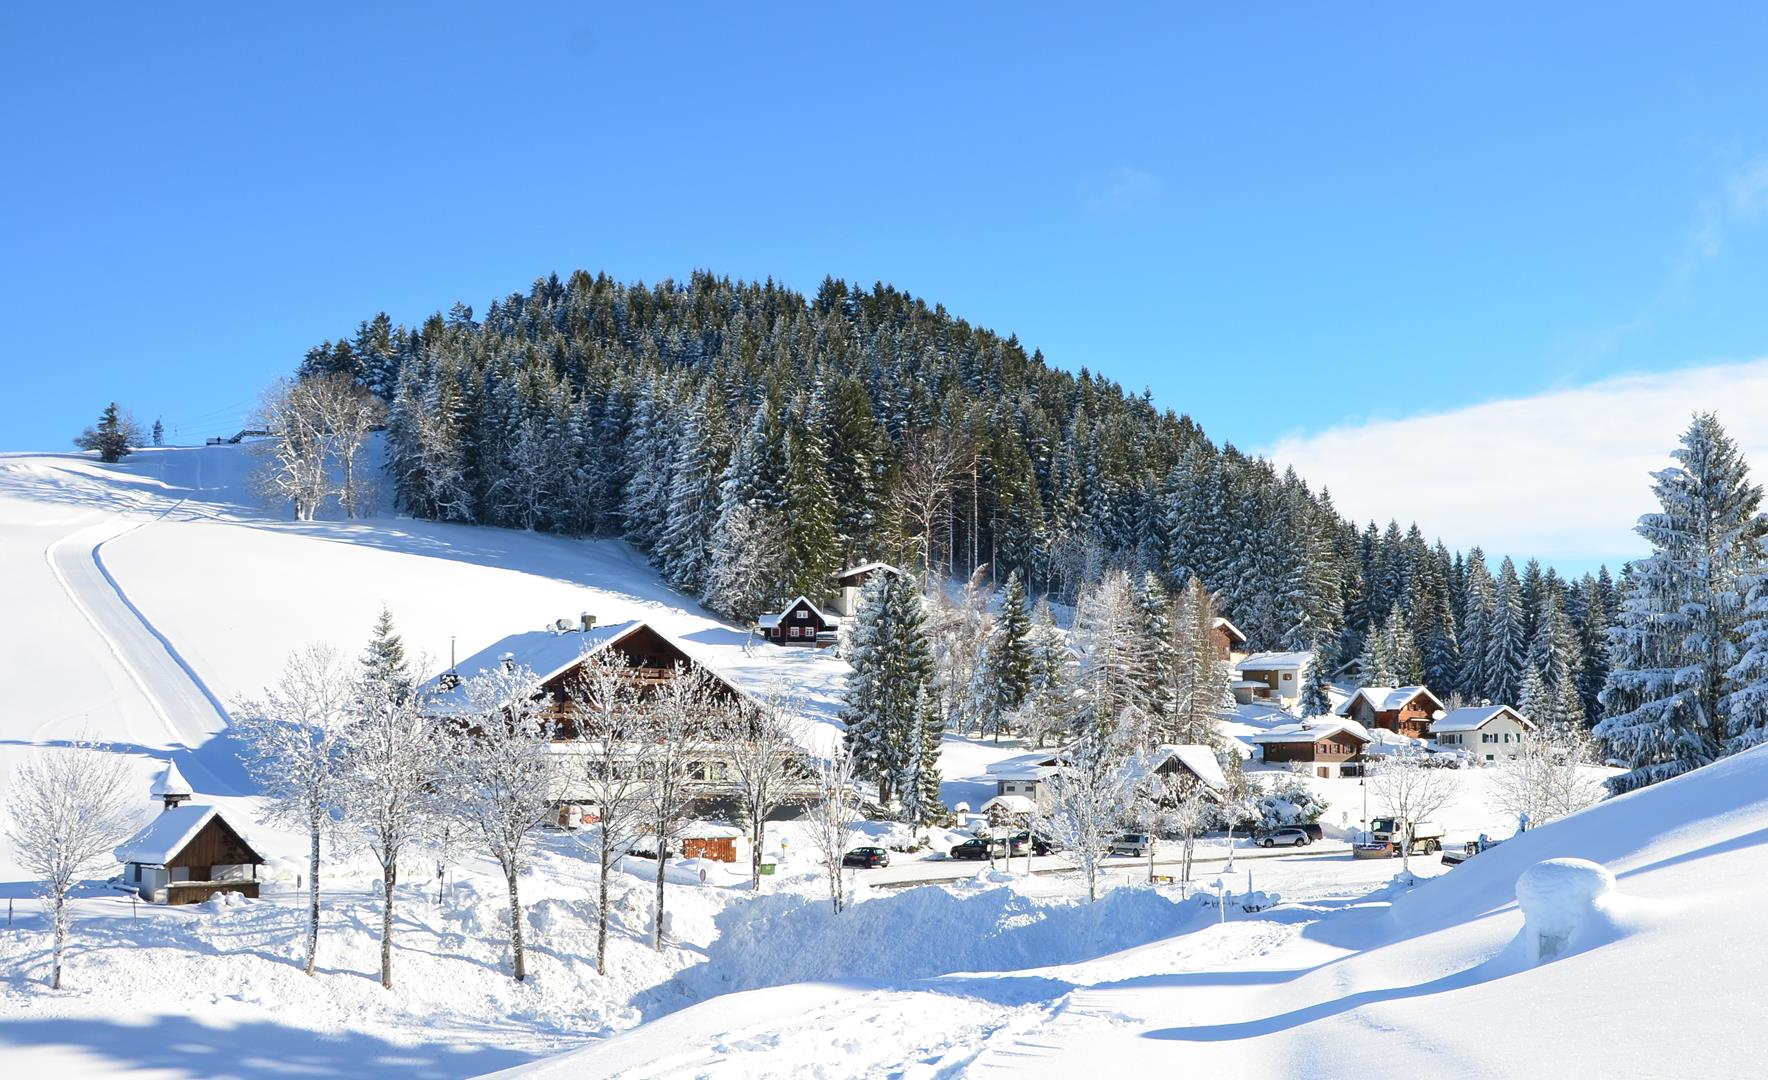 Winter 151217.19 (Copy).JPG